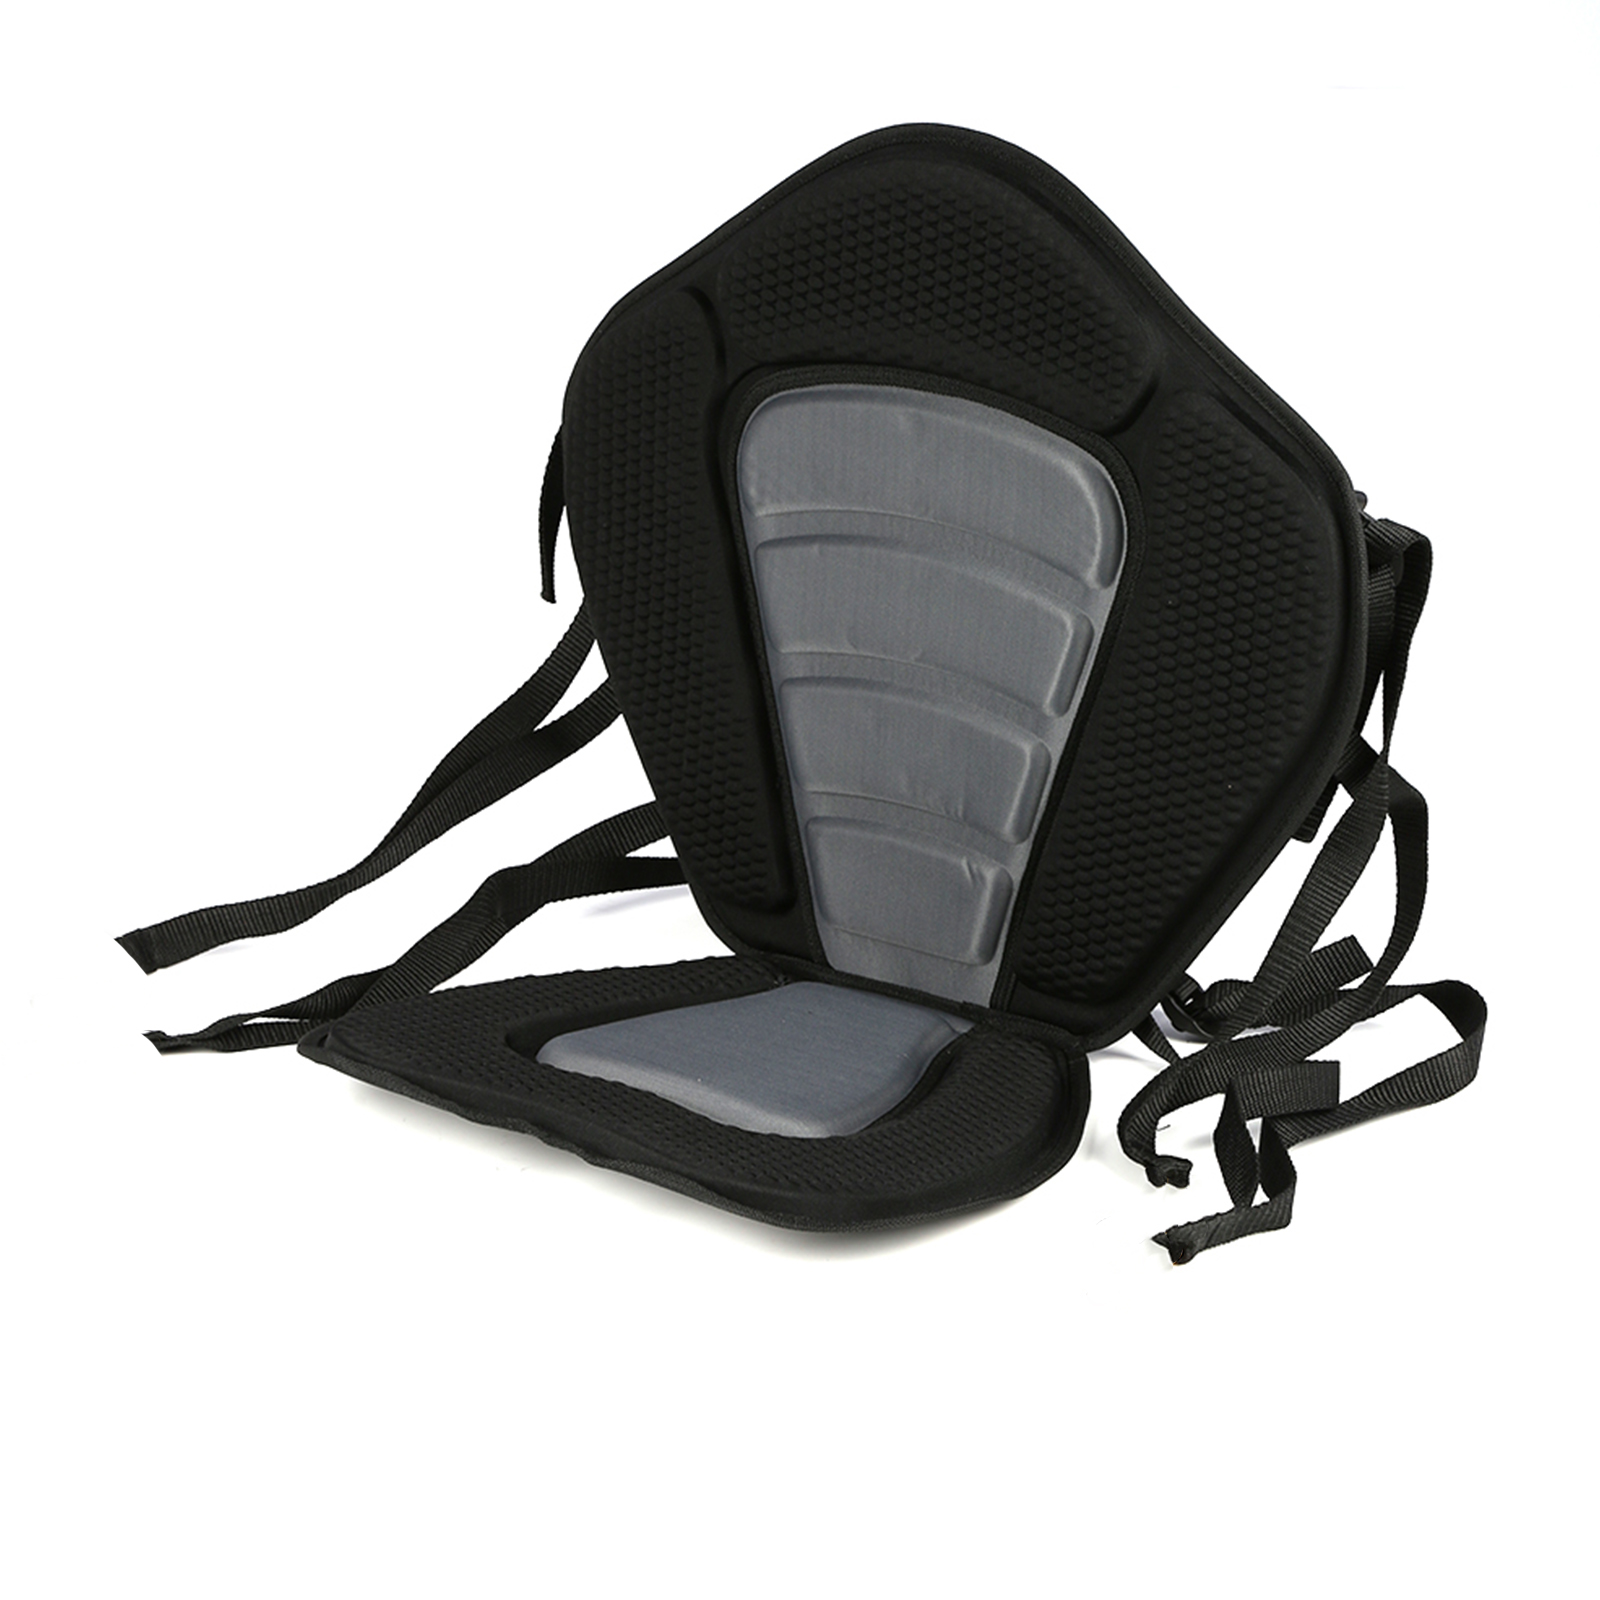 Adjustable Canoe Kayak Backrest Seat Storage Backpack Cushion Inflatable in Bag